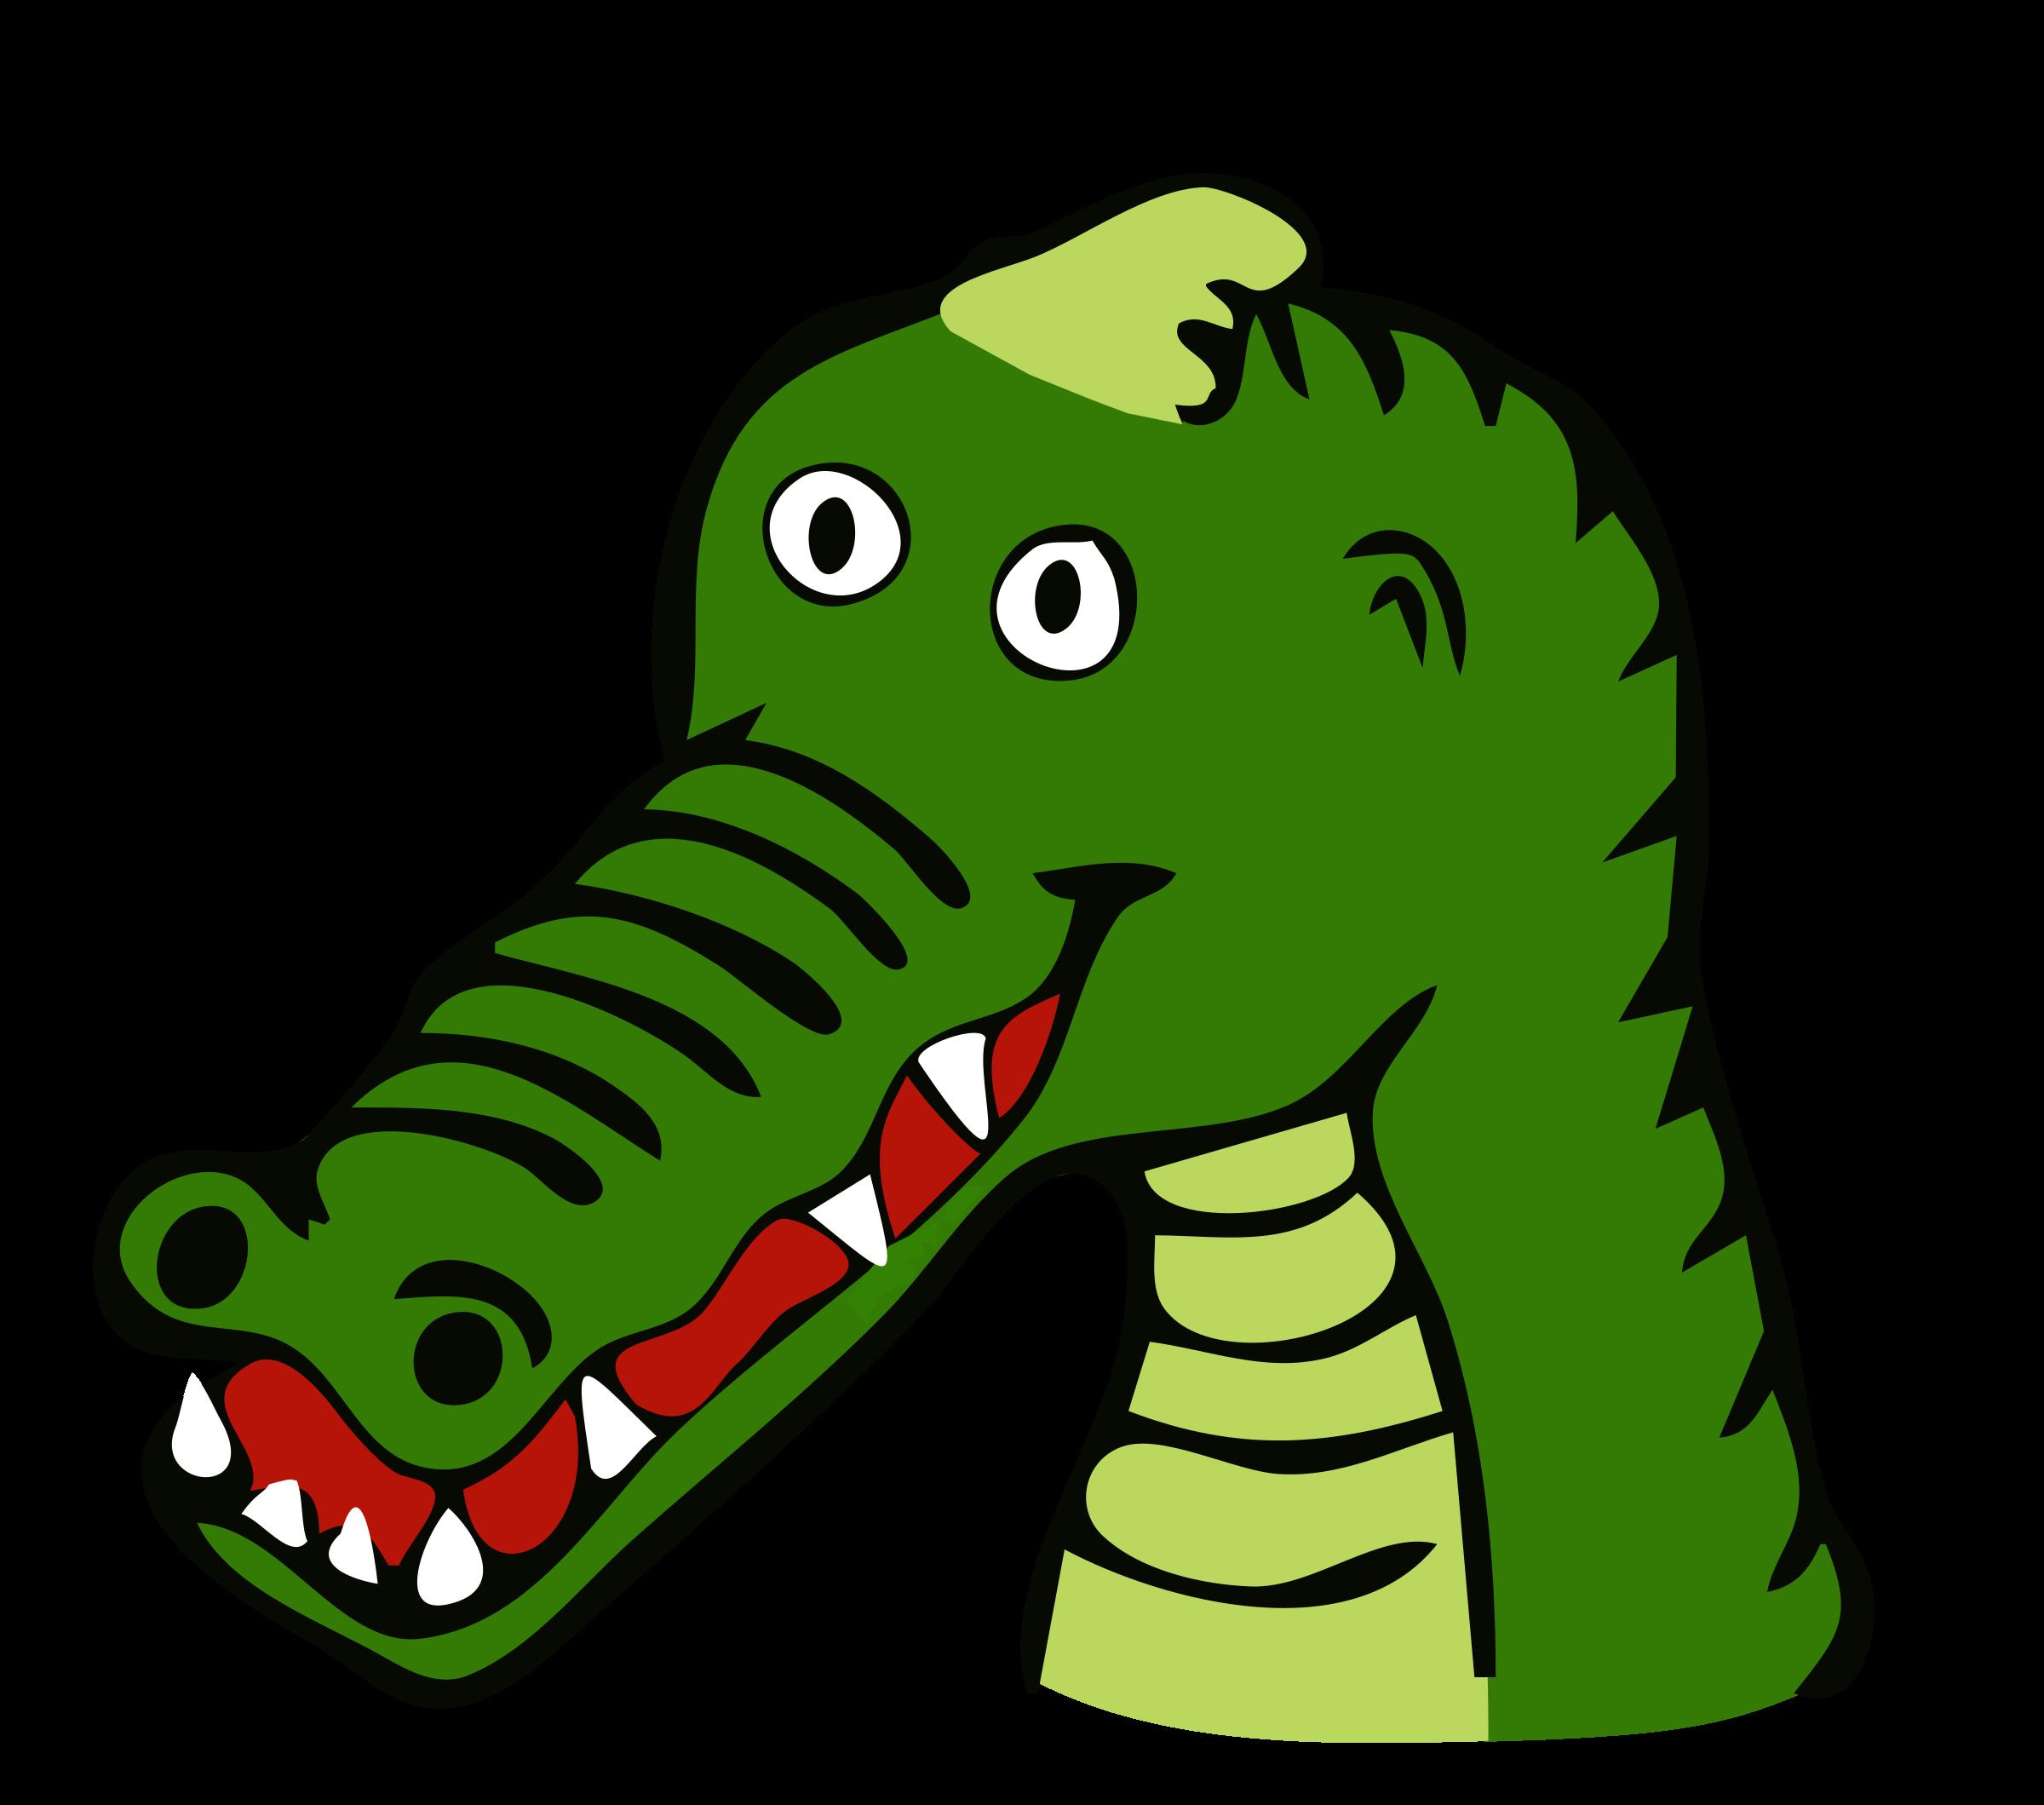 Drawn icons png free. Purple clipart crocodile